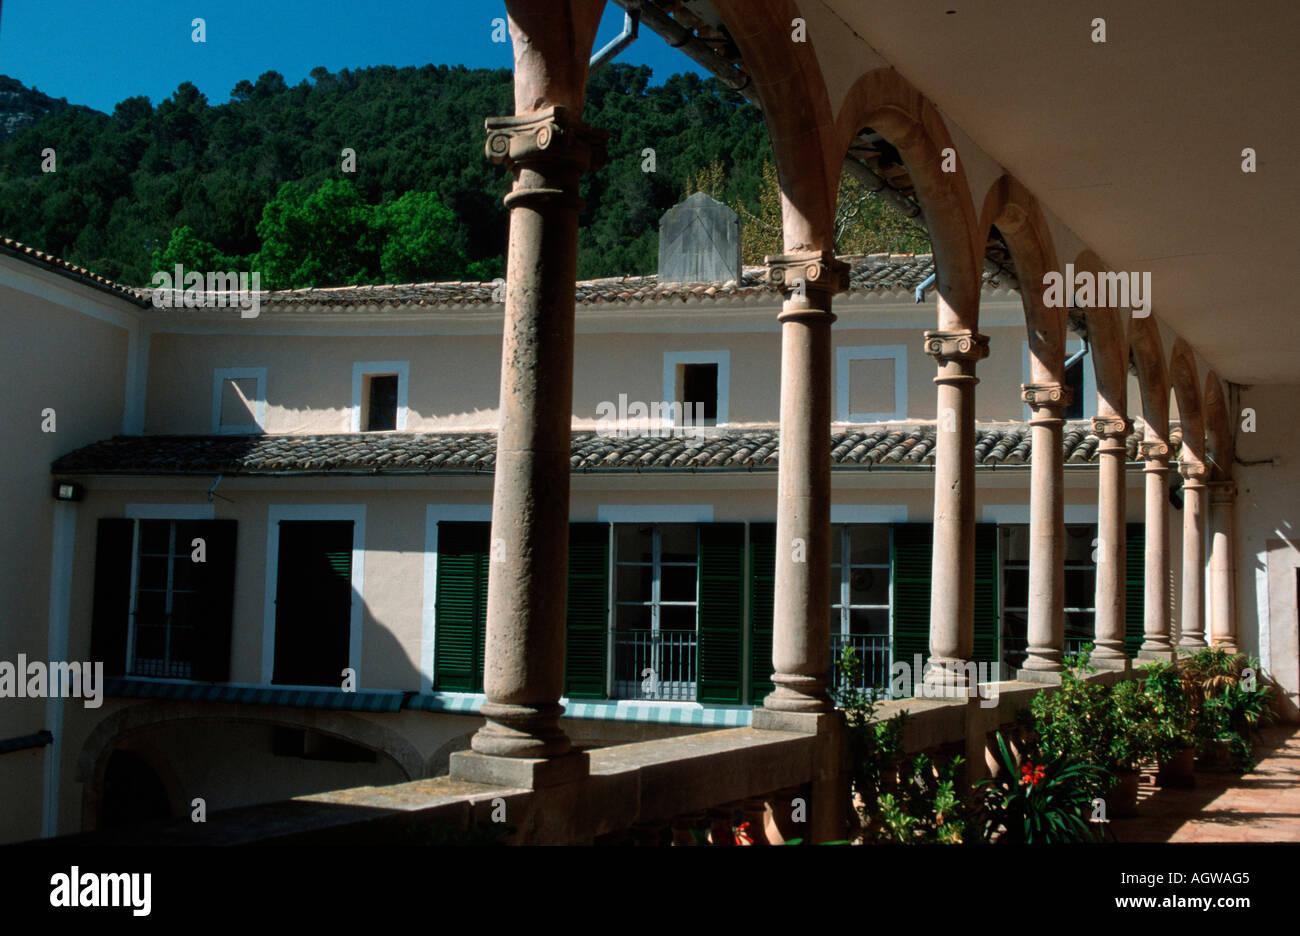 Estate / Sa Granja - Stock Image